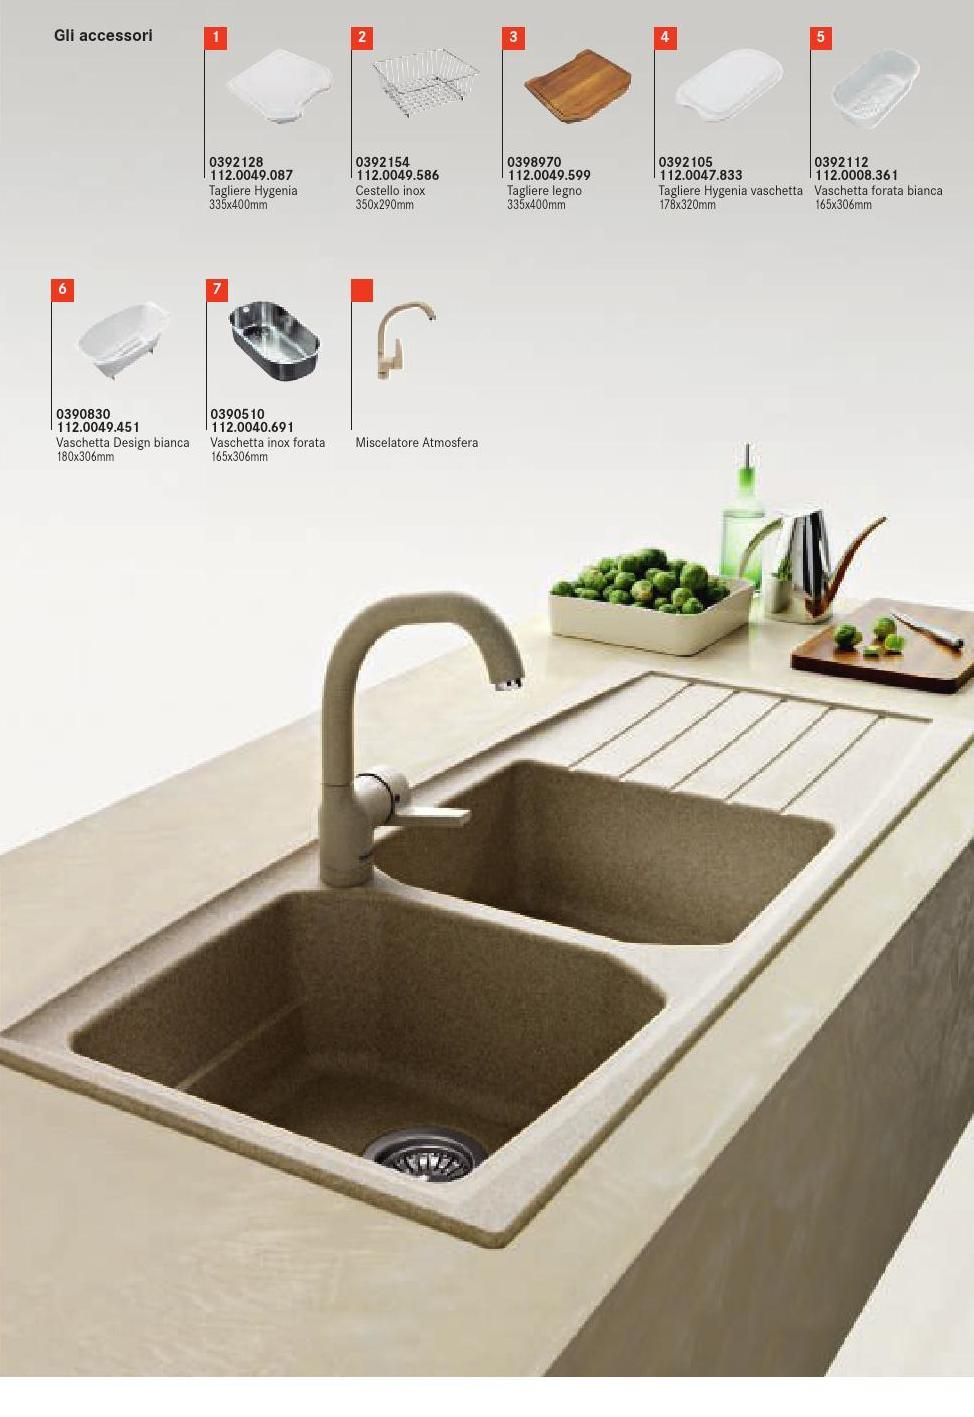 Franke italia catalogo 2016 | Idee per la Cucina | Pinterest | Italia